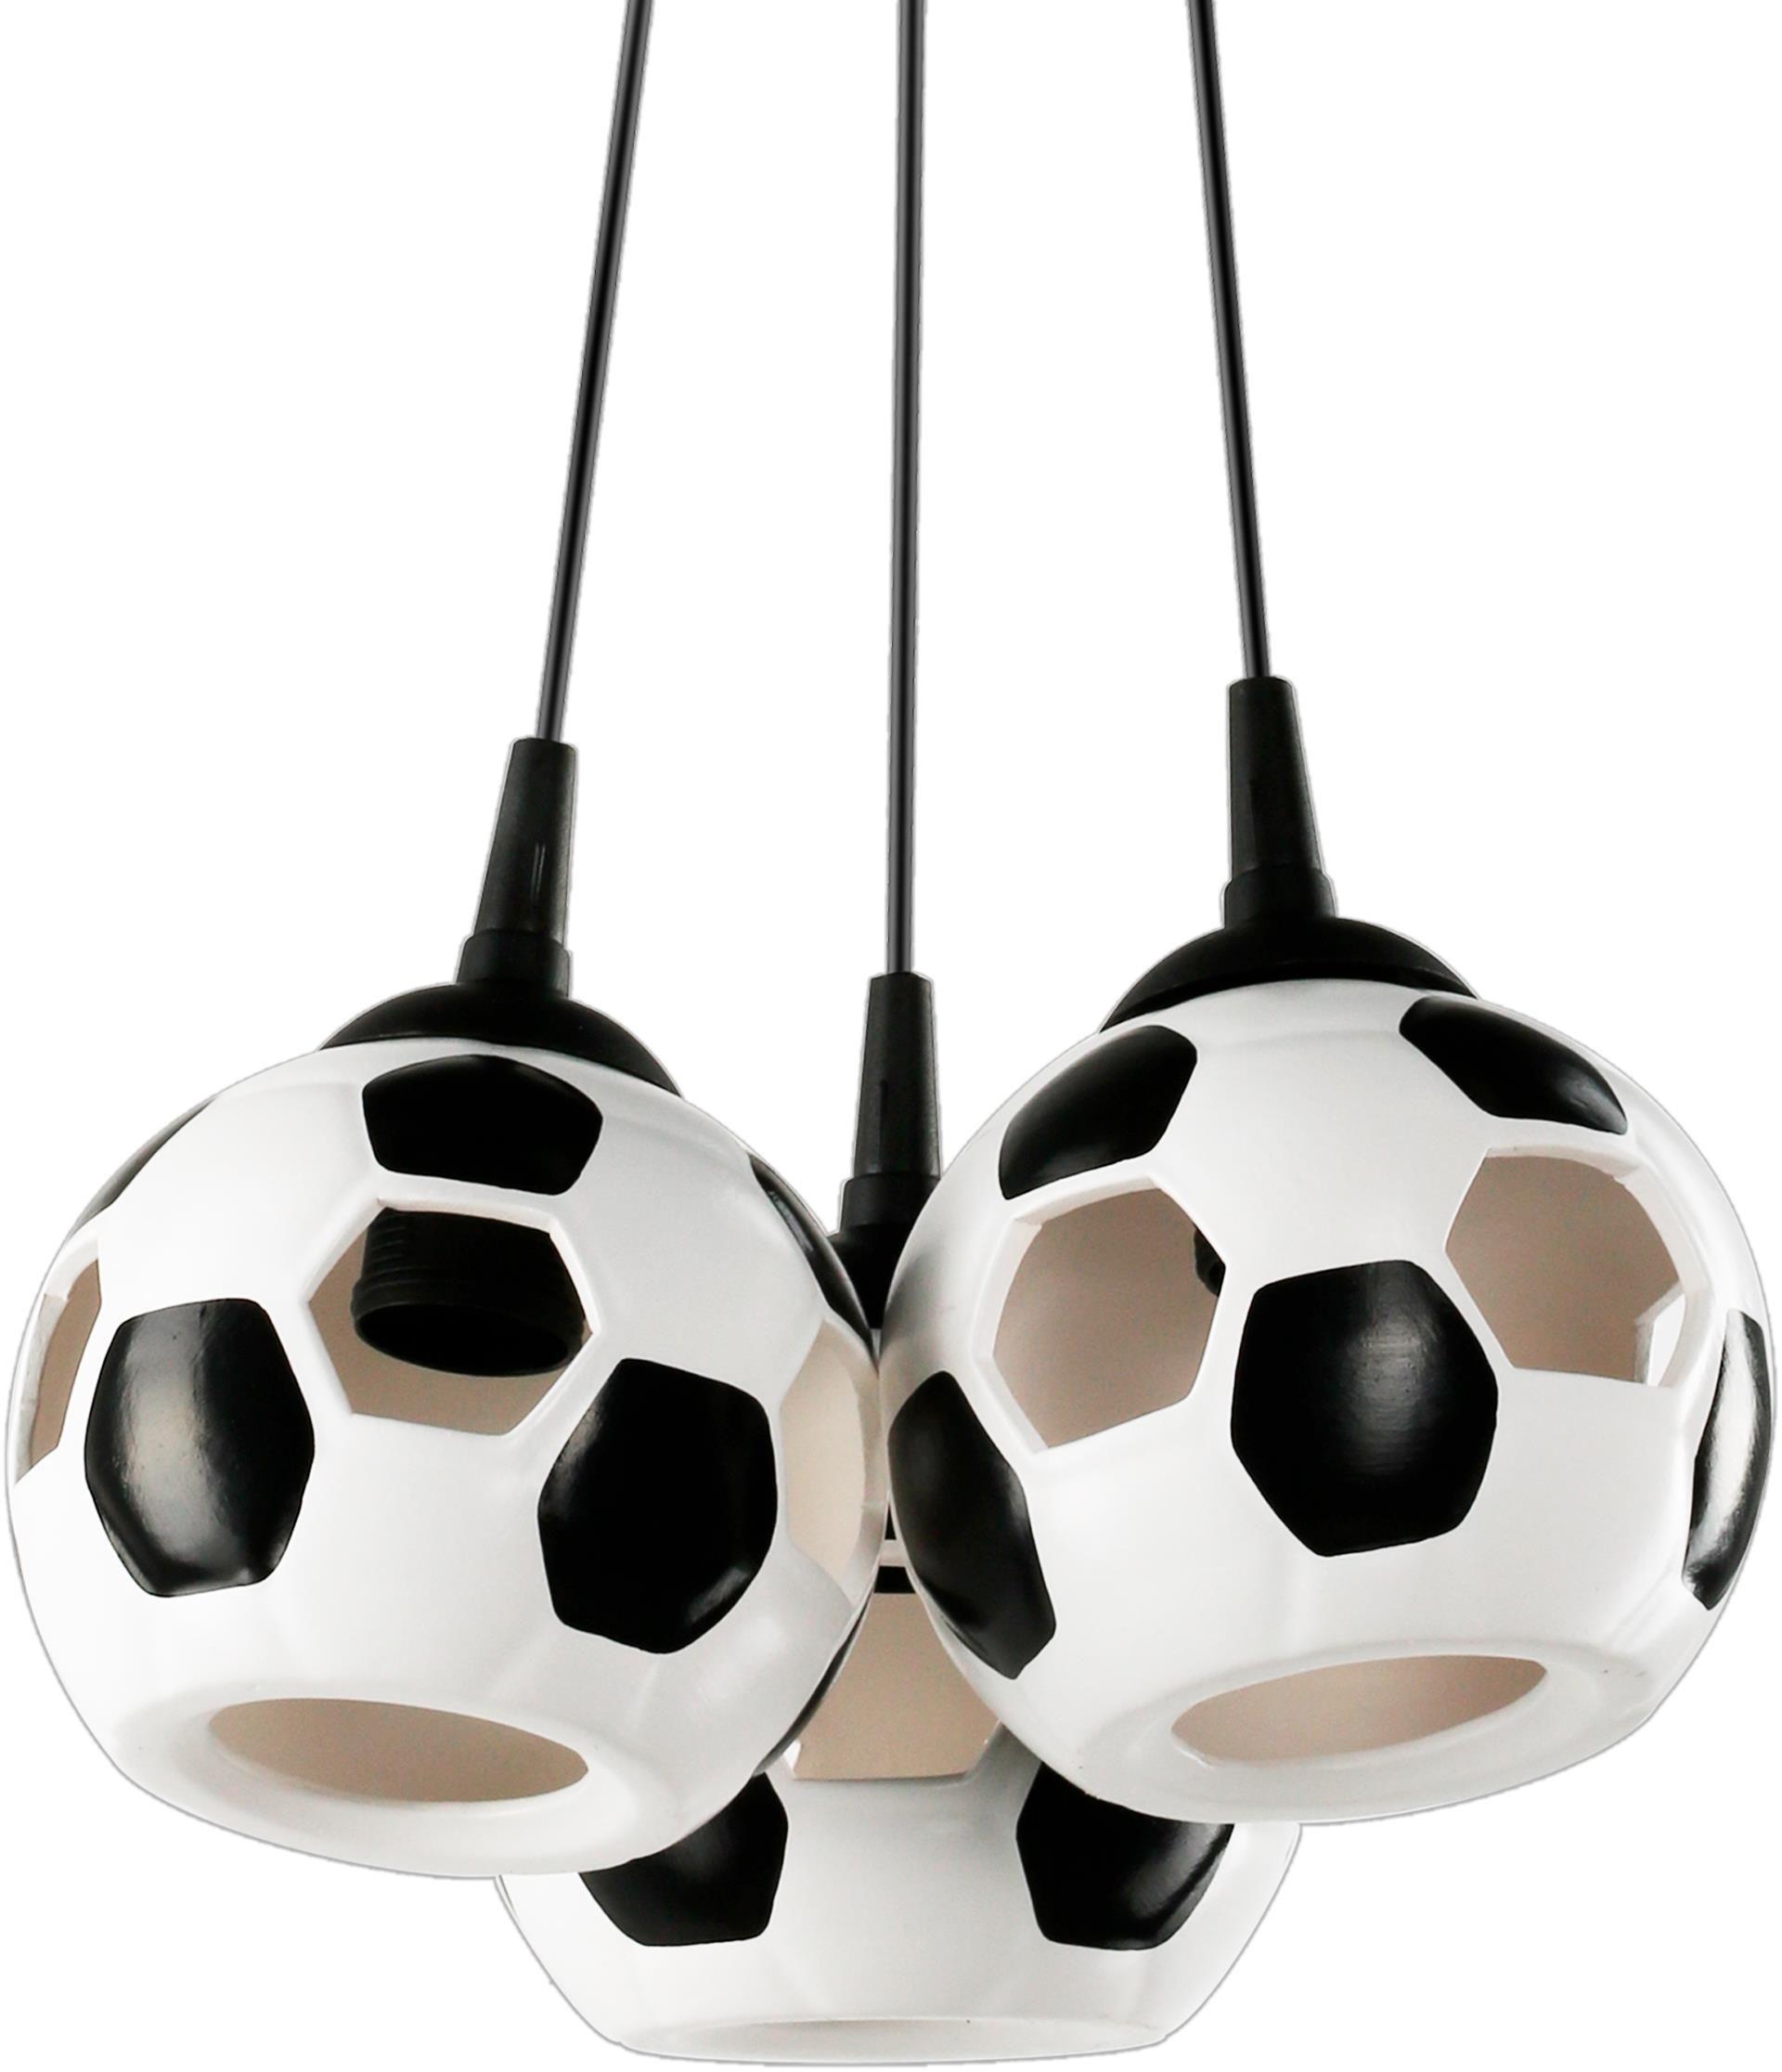 Lampex Mesi 3 651/3 lampa wisząca nowoczesna nowoczesna ceramika 3x60W E27 30cm